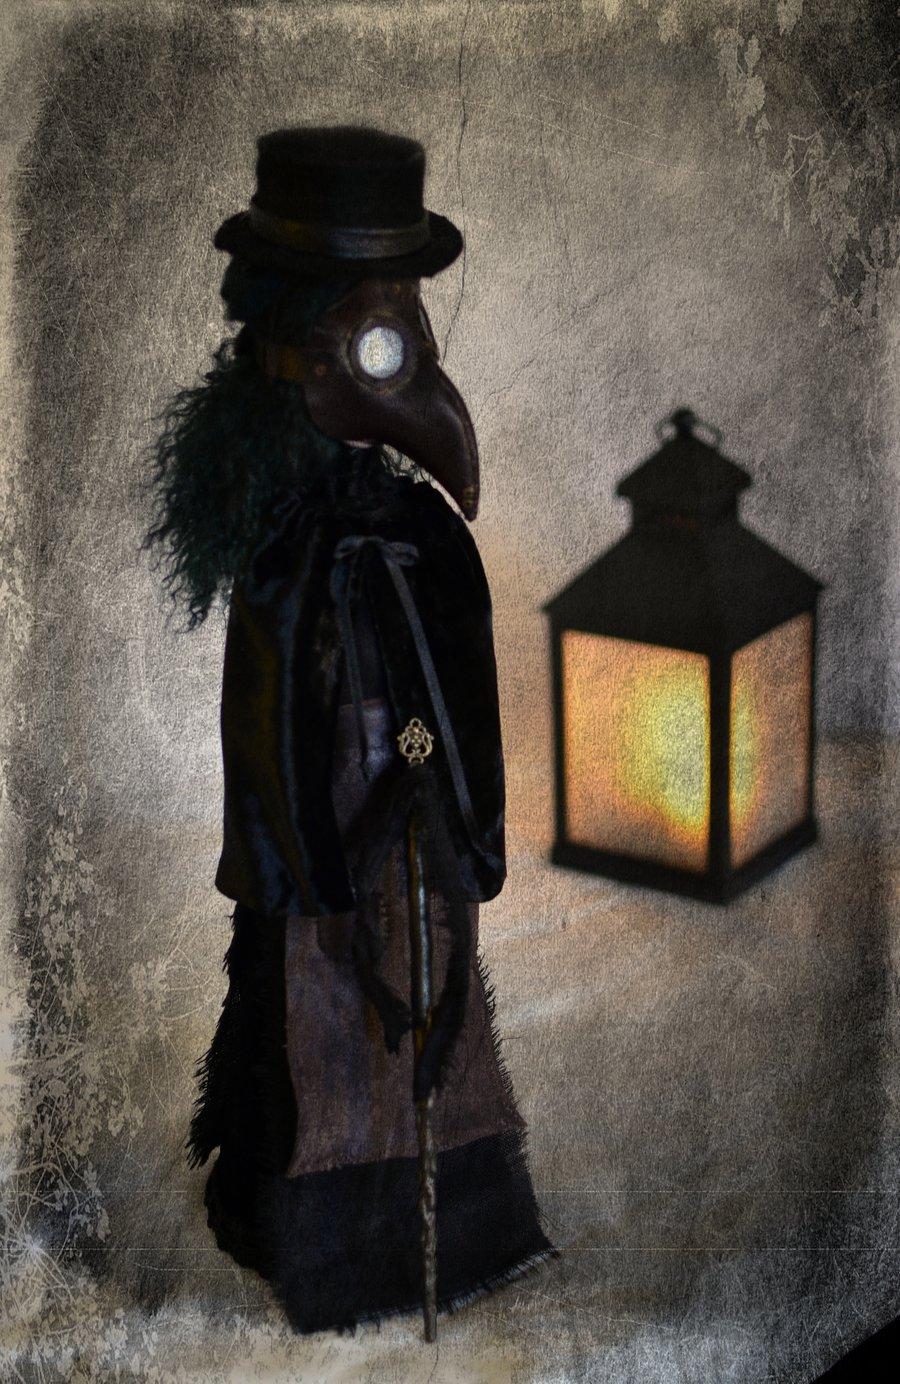 Image of *RESERVED* 2/2 Memento Mori: Litaneía ad Mortem. OOAK handmade dark art doll. The plague doctor.